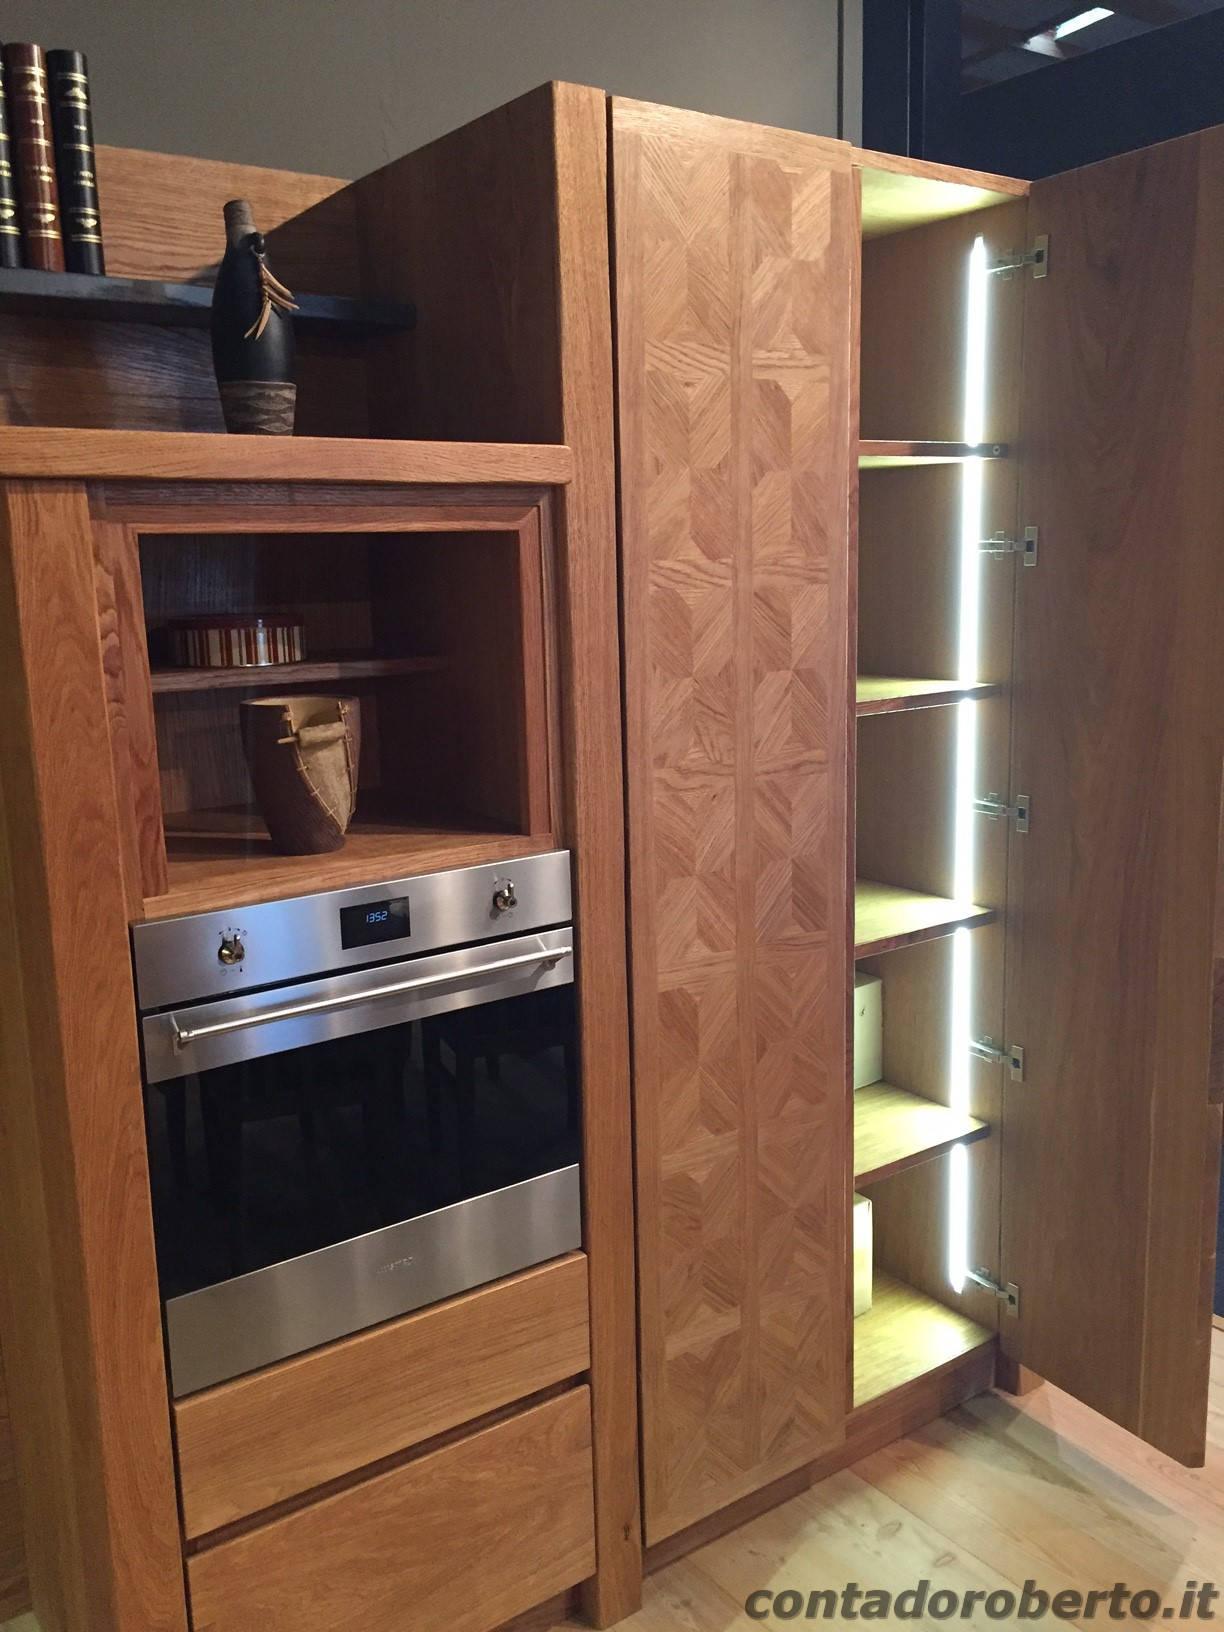 Cucina moderna in rovere naturale manerba contado roberto group cucine e arredamenti su - Cucina in legno moderna ...